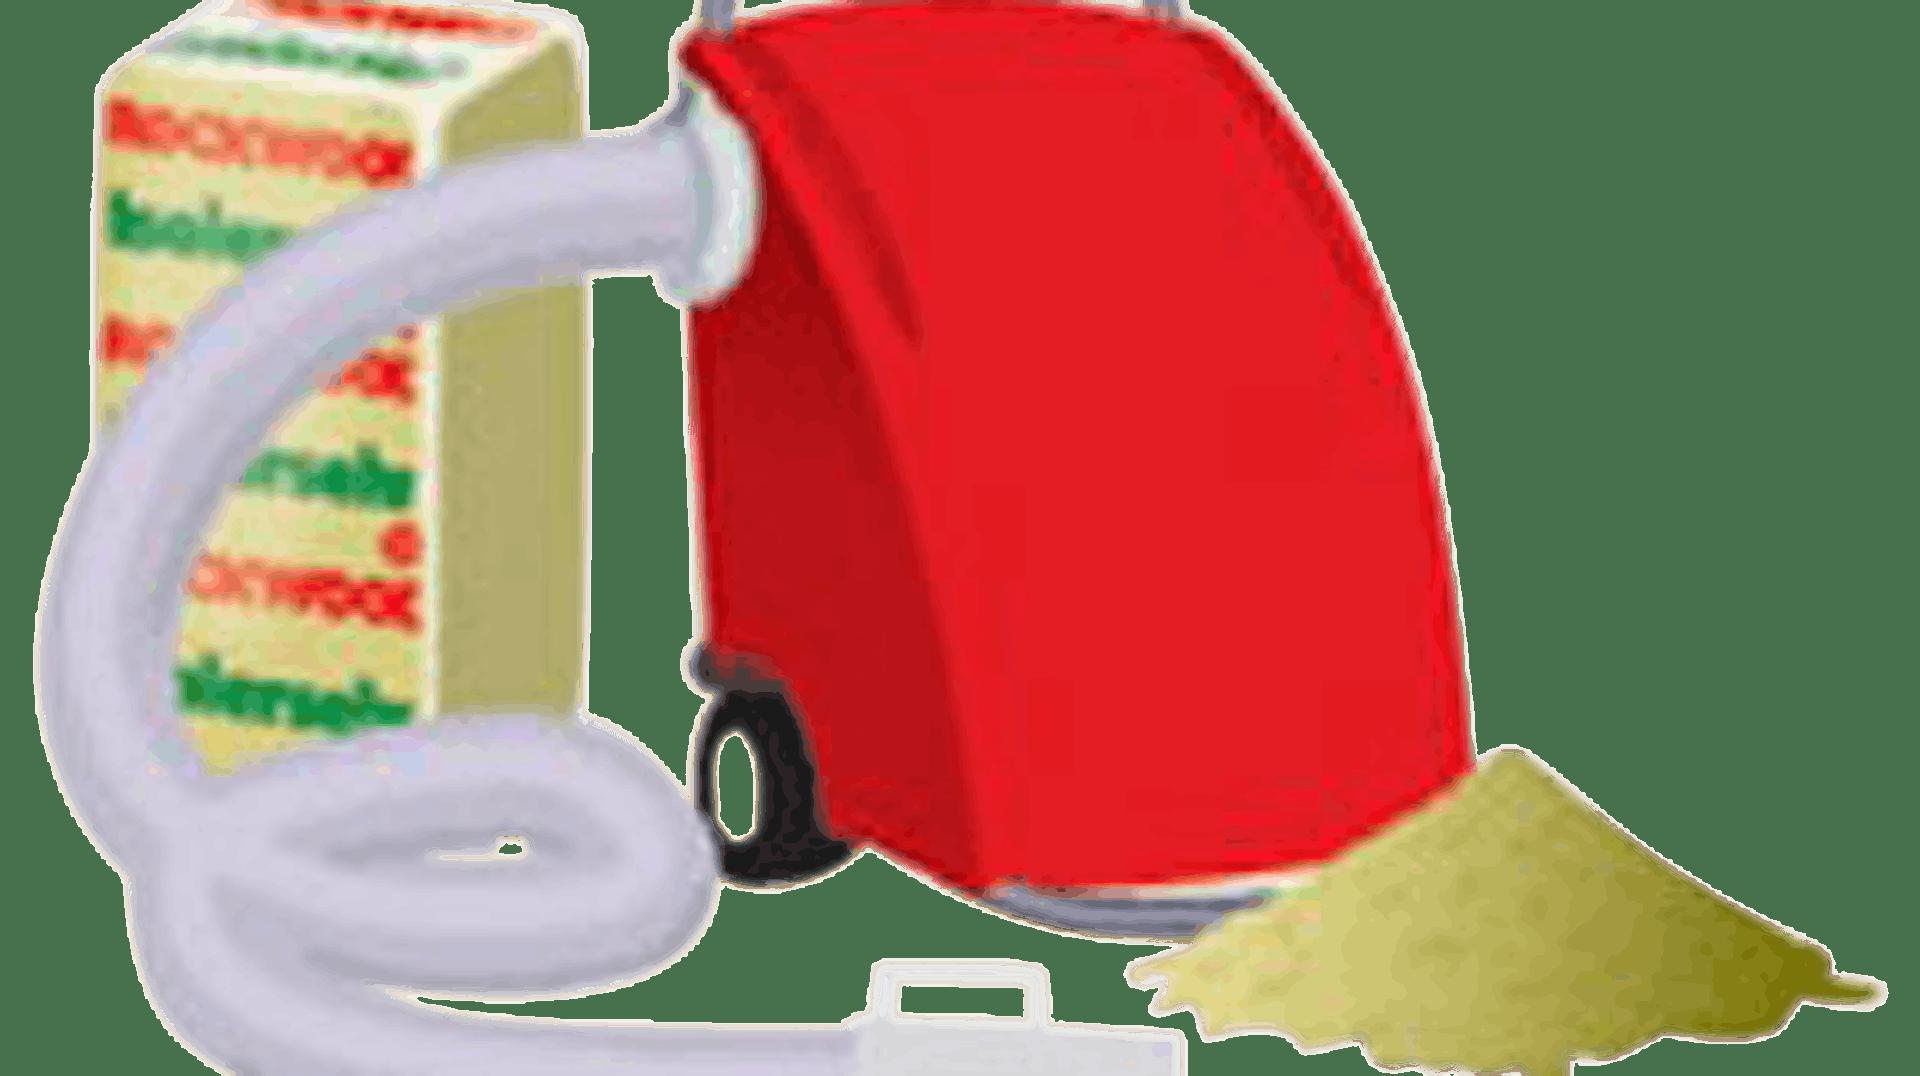 Product picture, ROCKSTER Løsullmaskin, ROXULL Vindsullsspruta